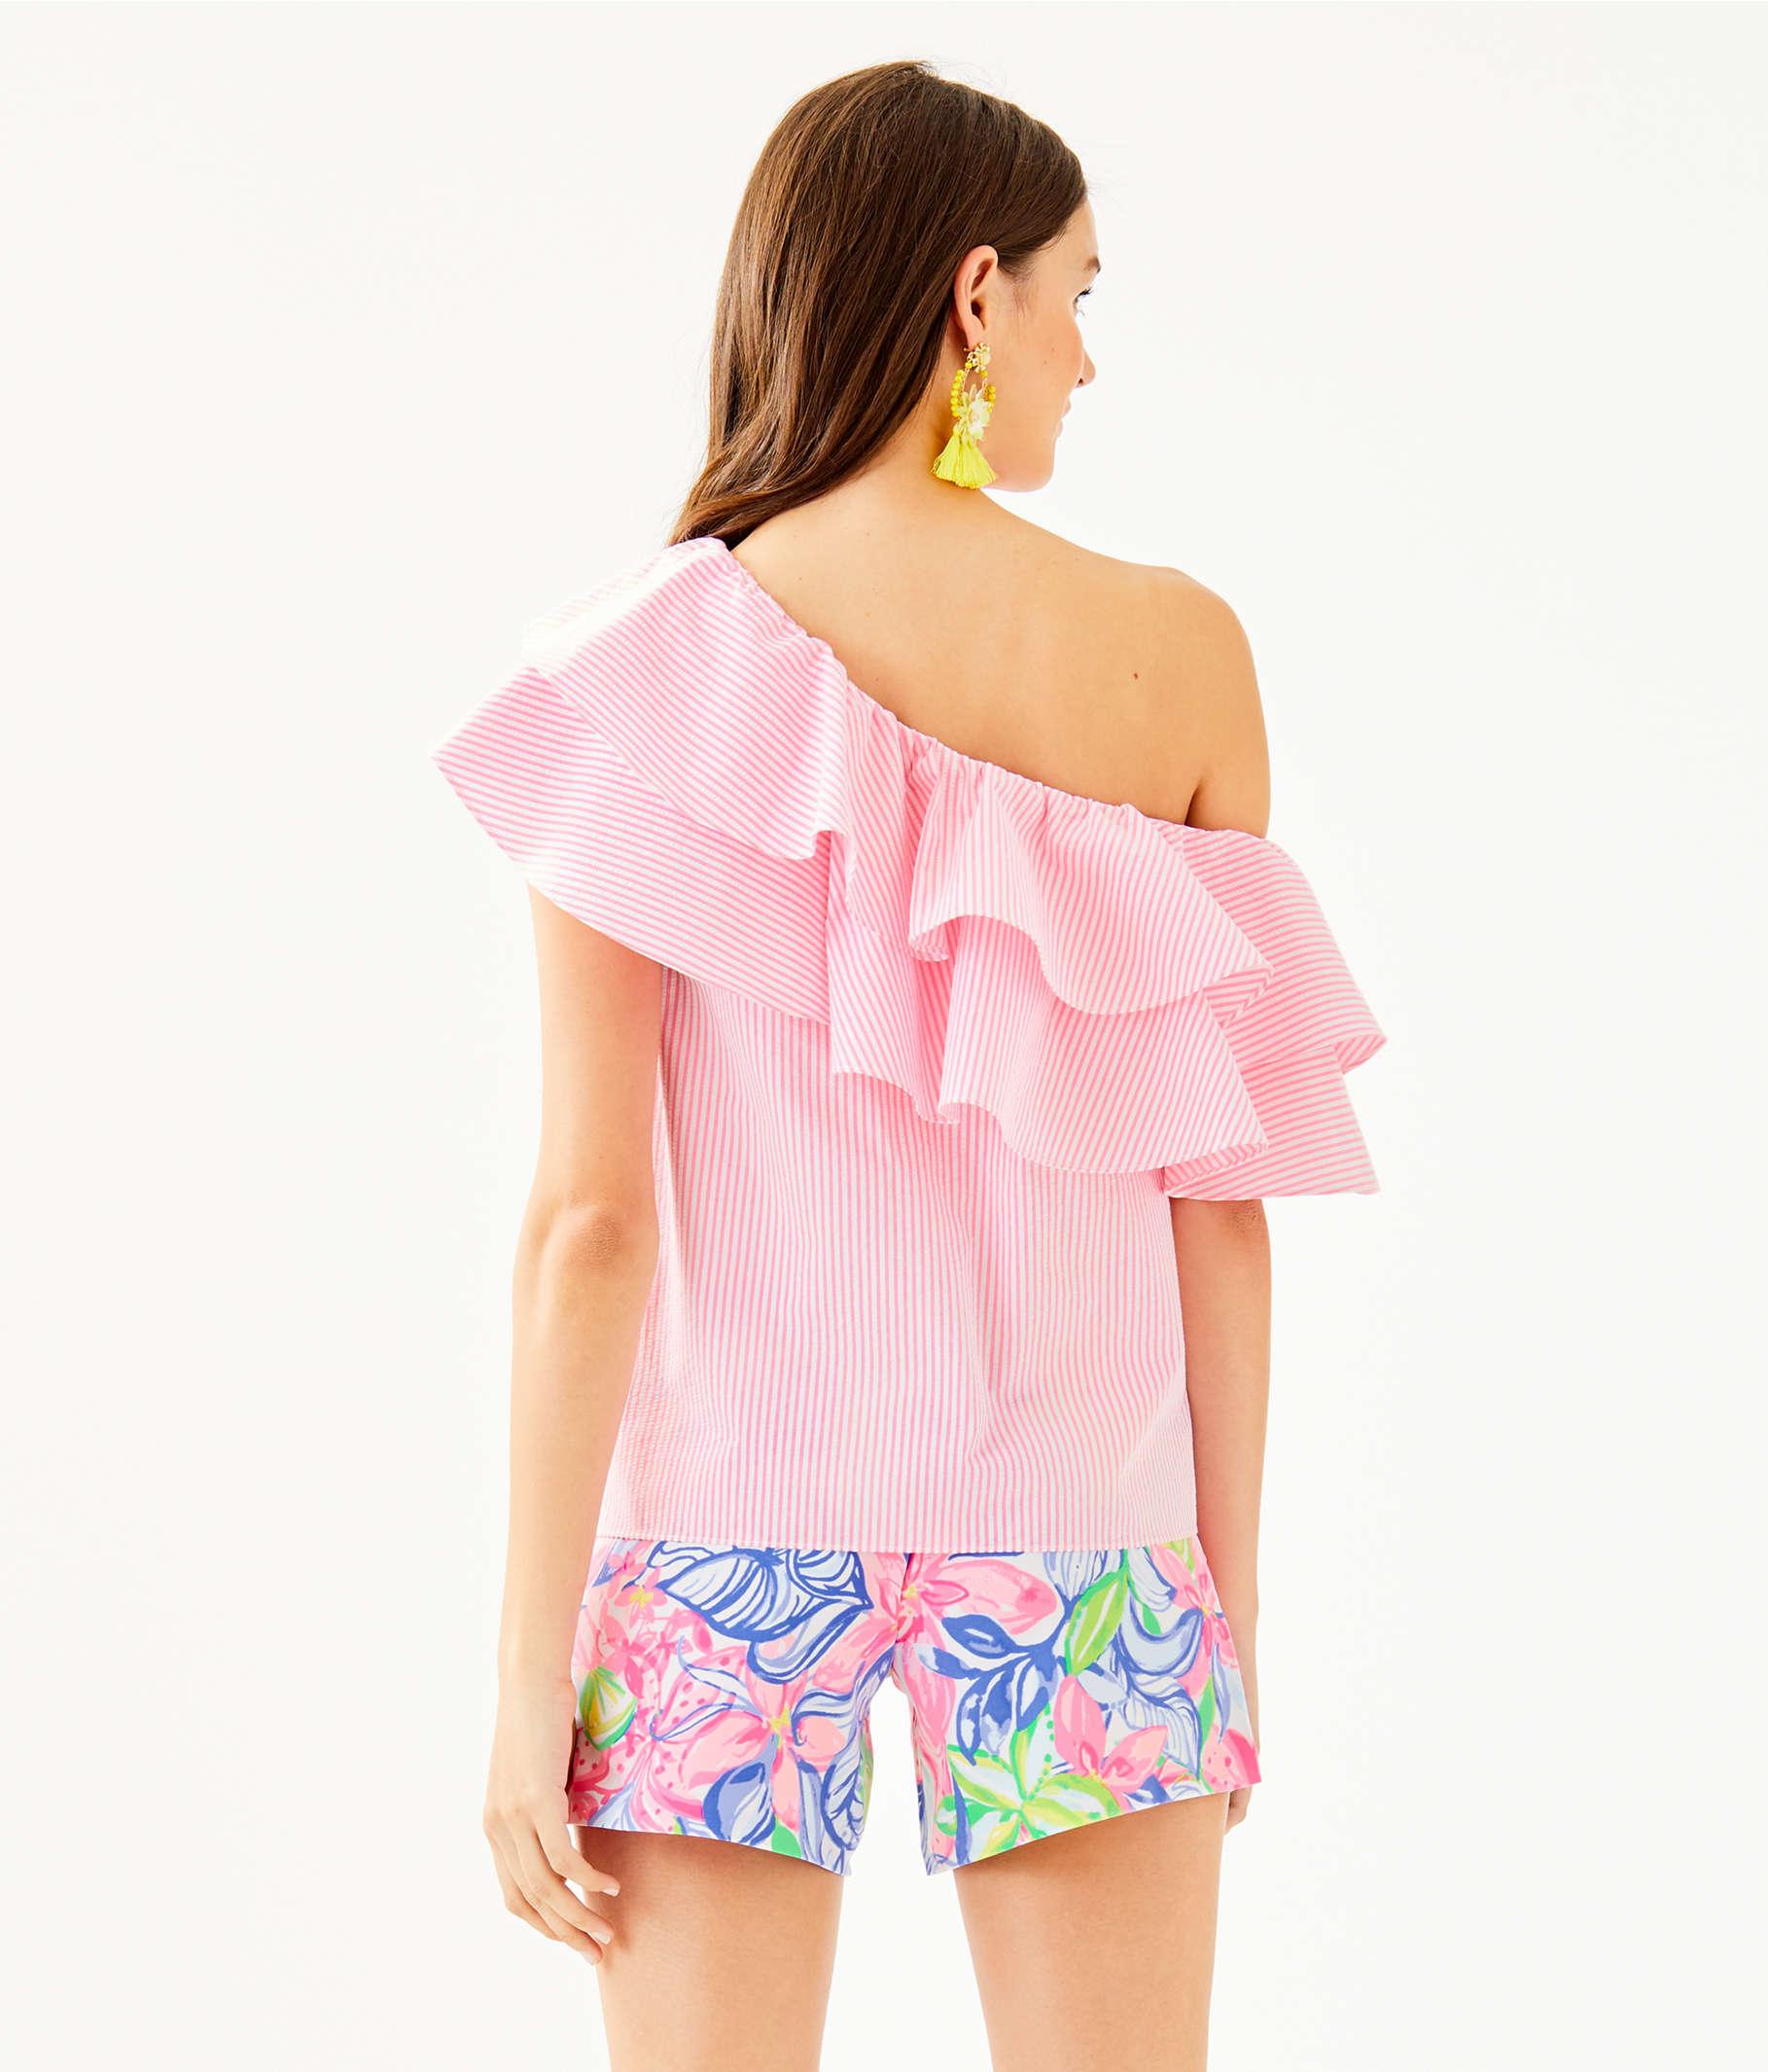 b113e3f7da4 ... Trixie One-Shoulder Top, Havana Pink Yarn Dye Seersucker, large ...